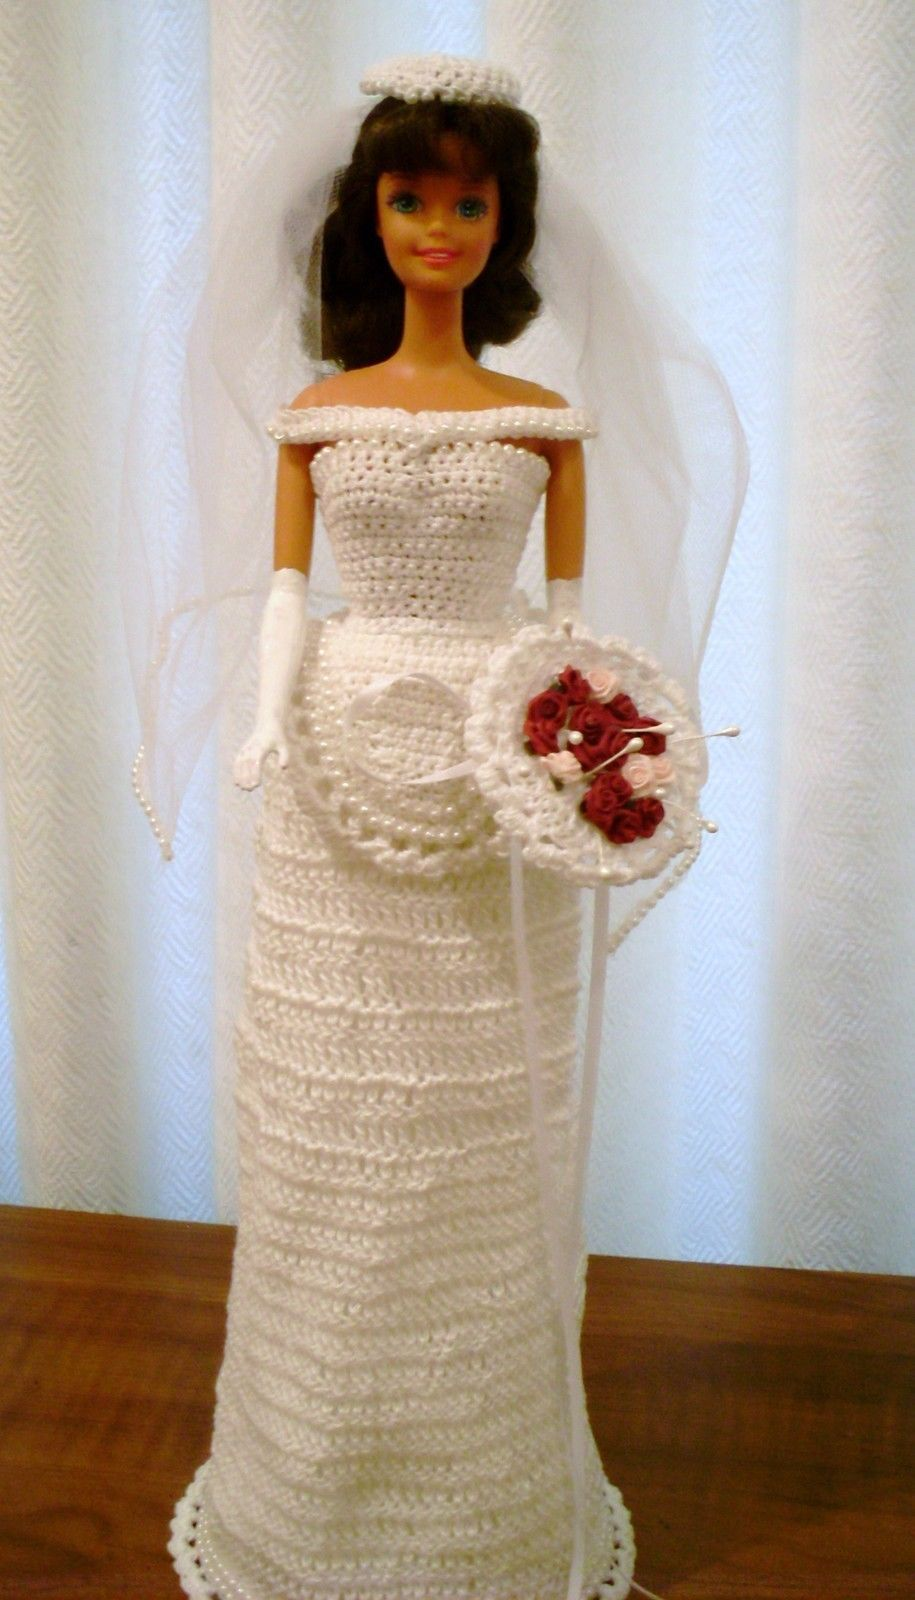 Bride Doll Barbie 2 012 eBay Bride dolls, Barbie